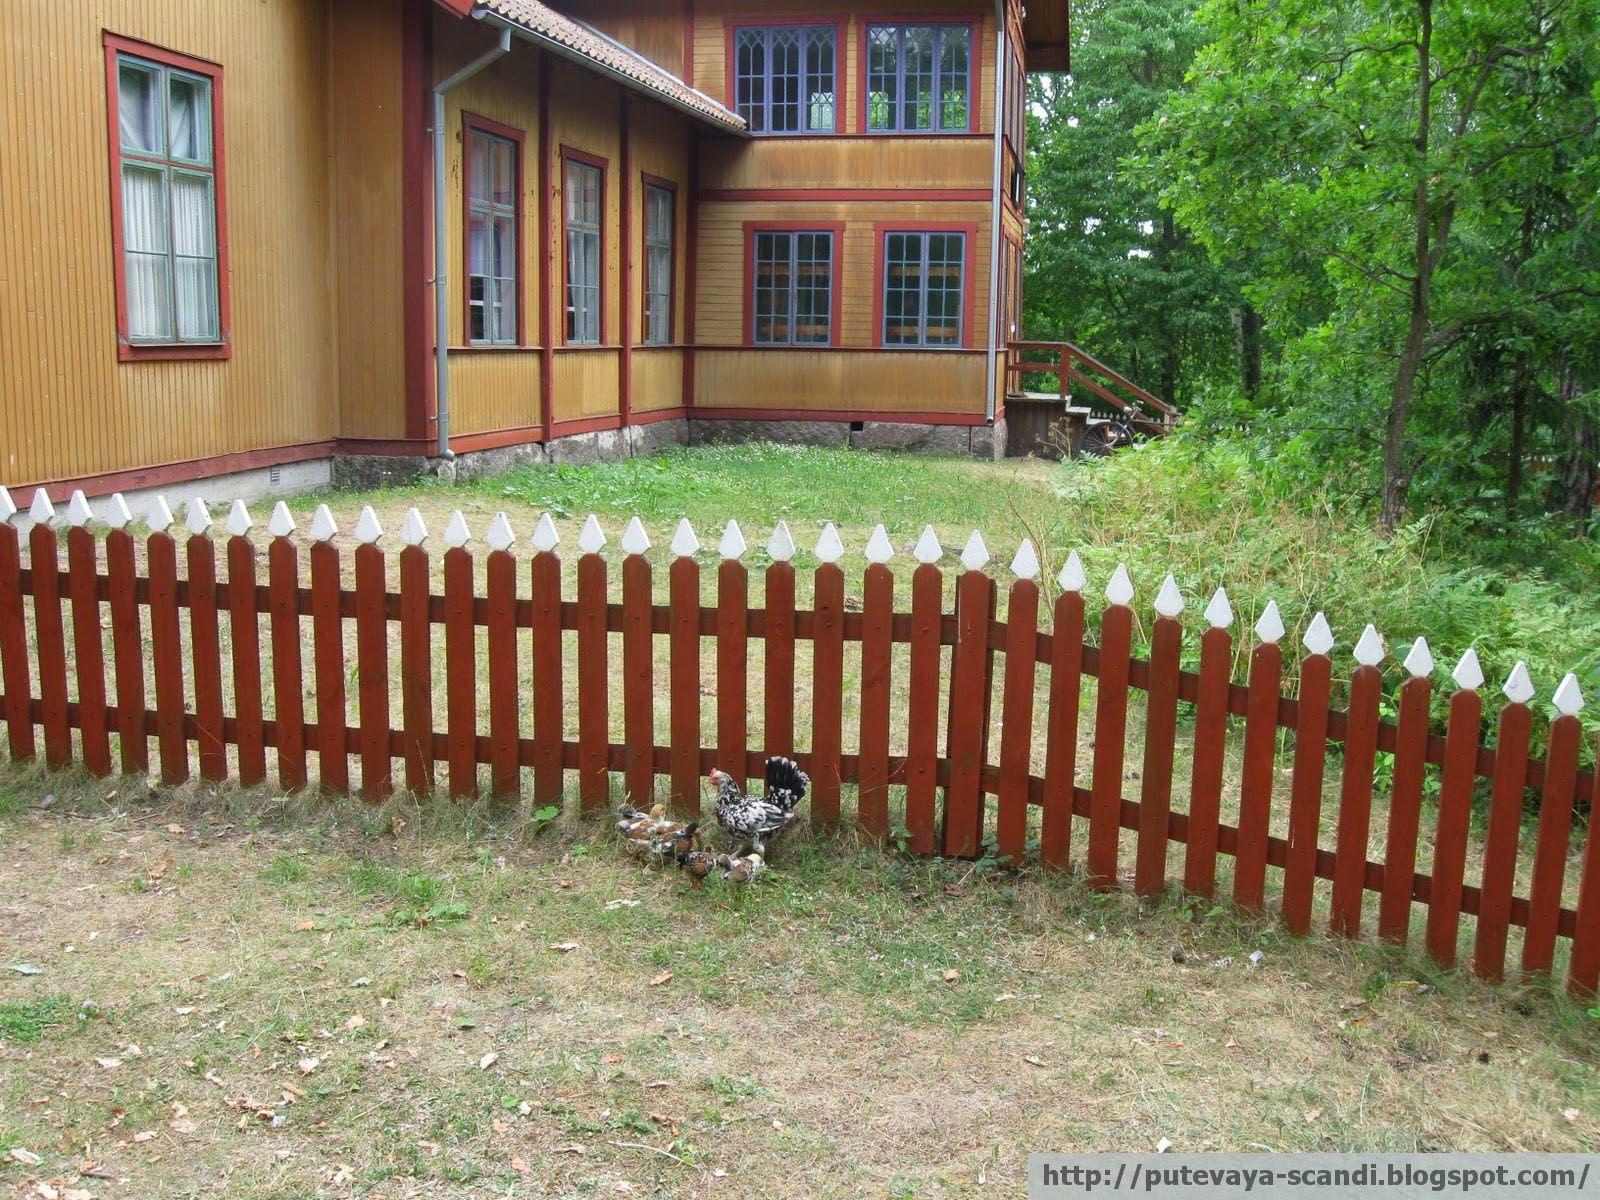 Skansen poultry